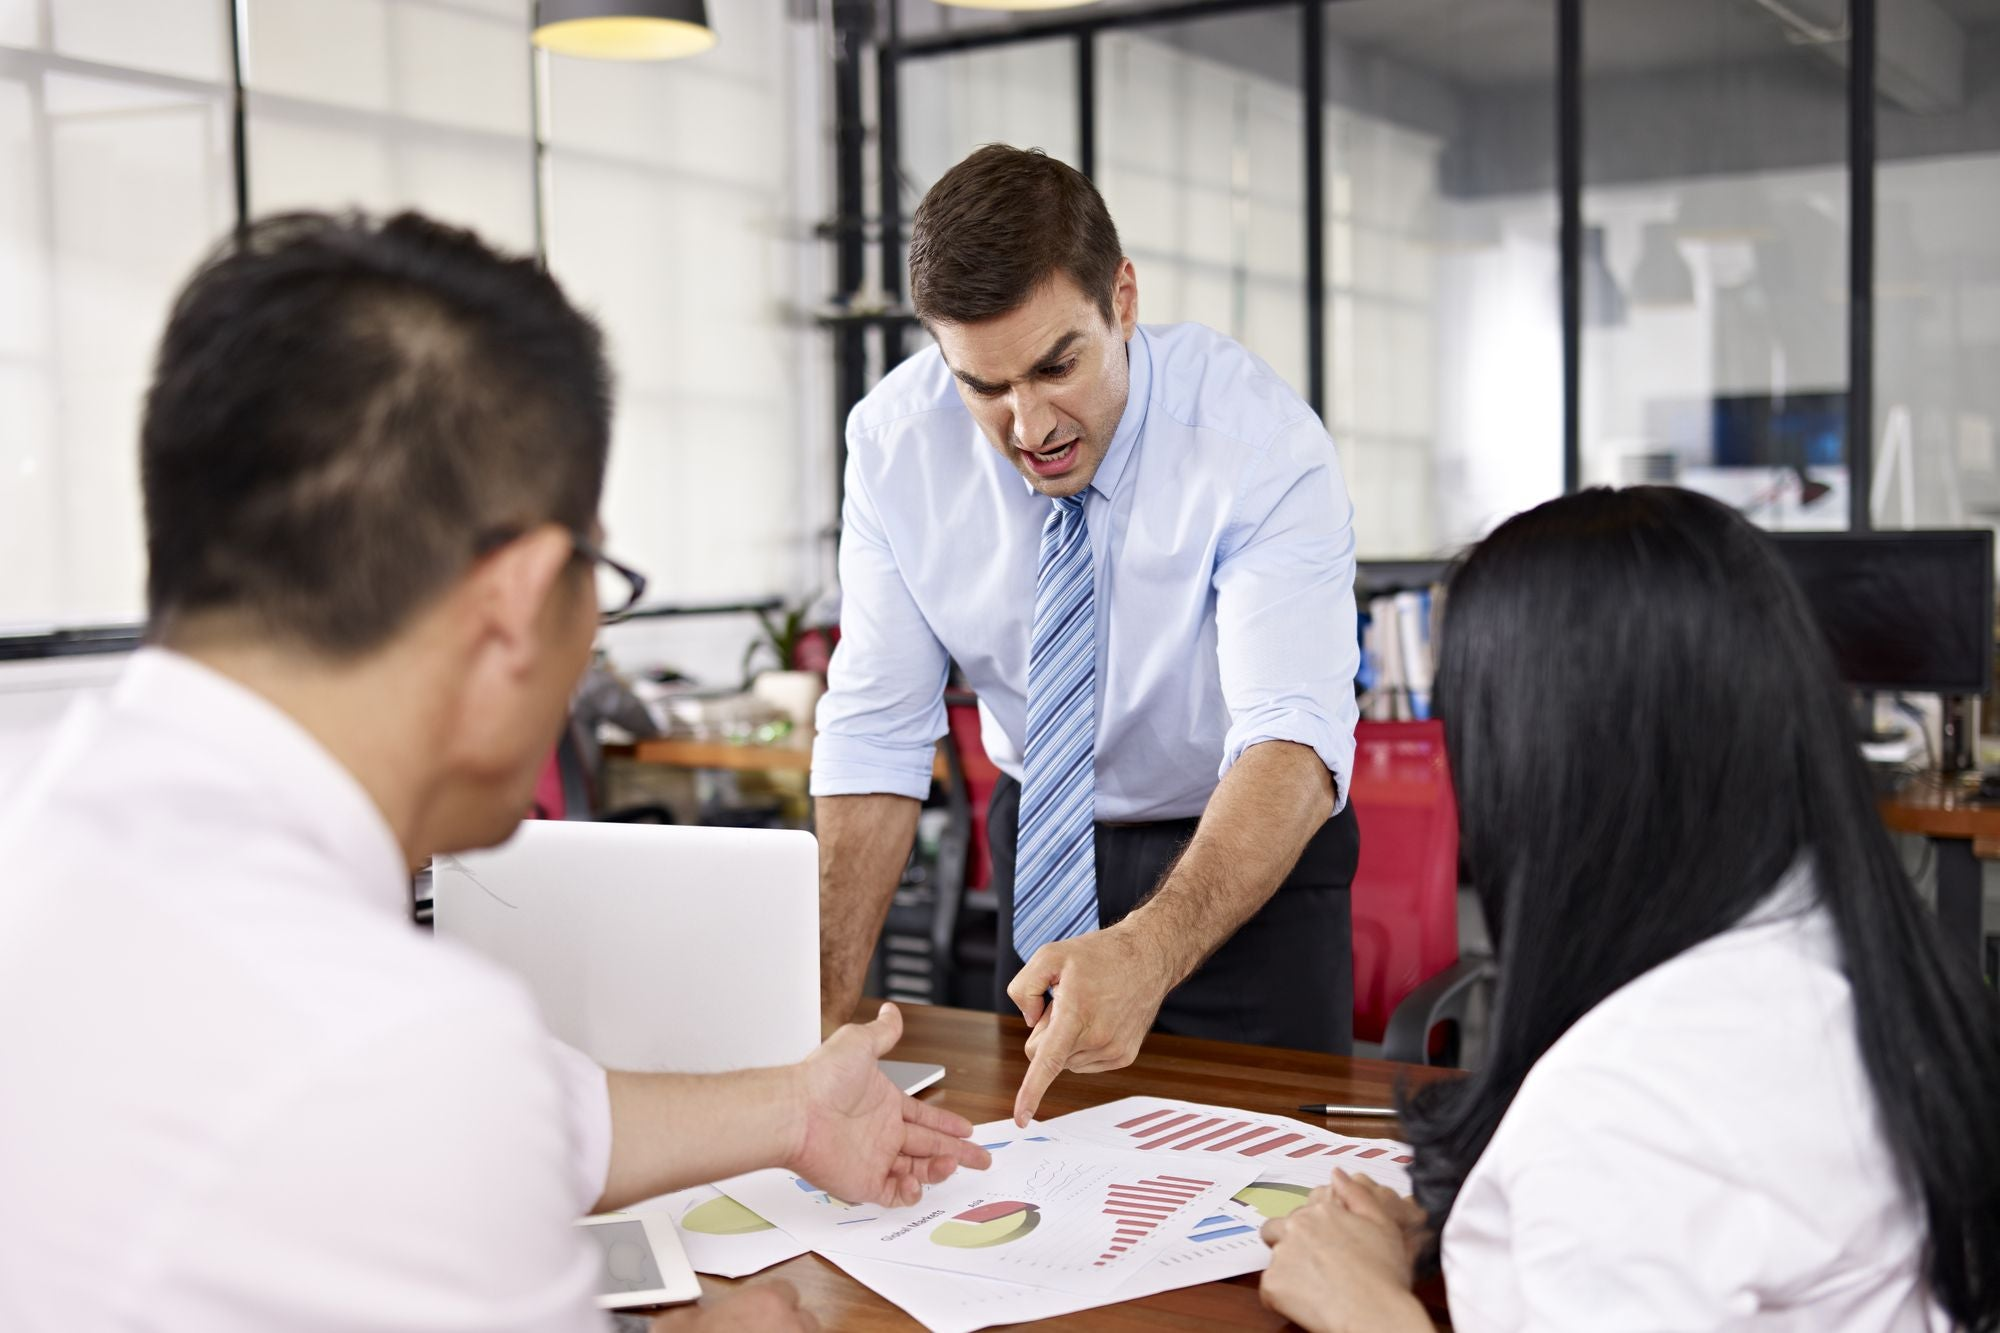 نتيجة بحث الصور عن How to Work for a Boss Who Has a New Idea Every 5 Minutes